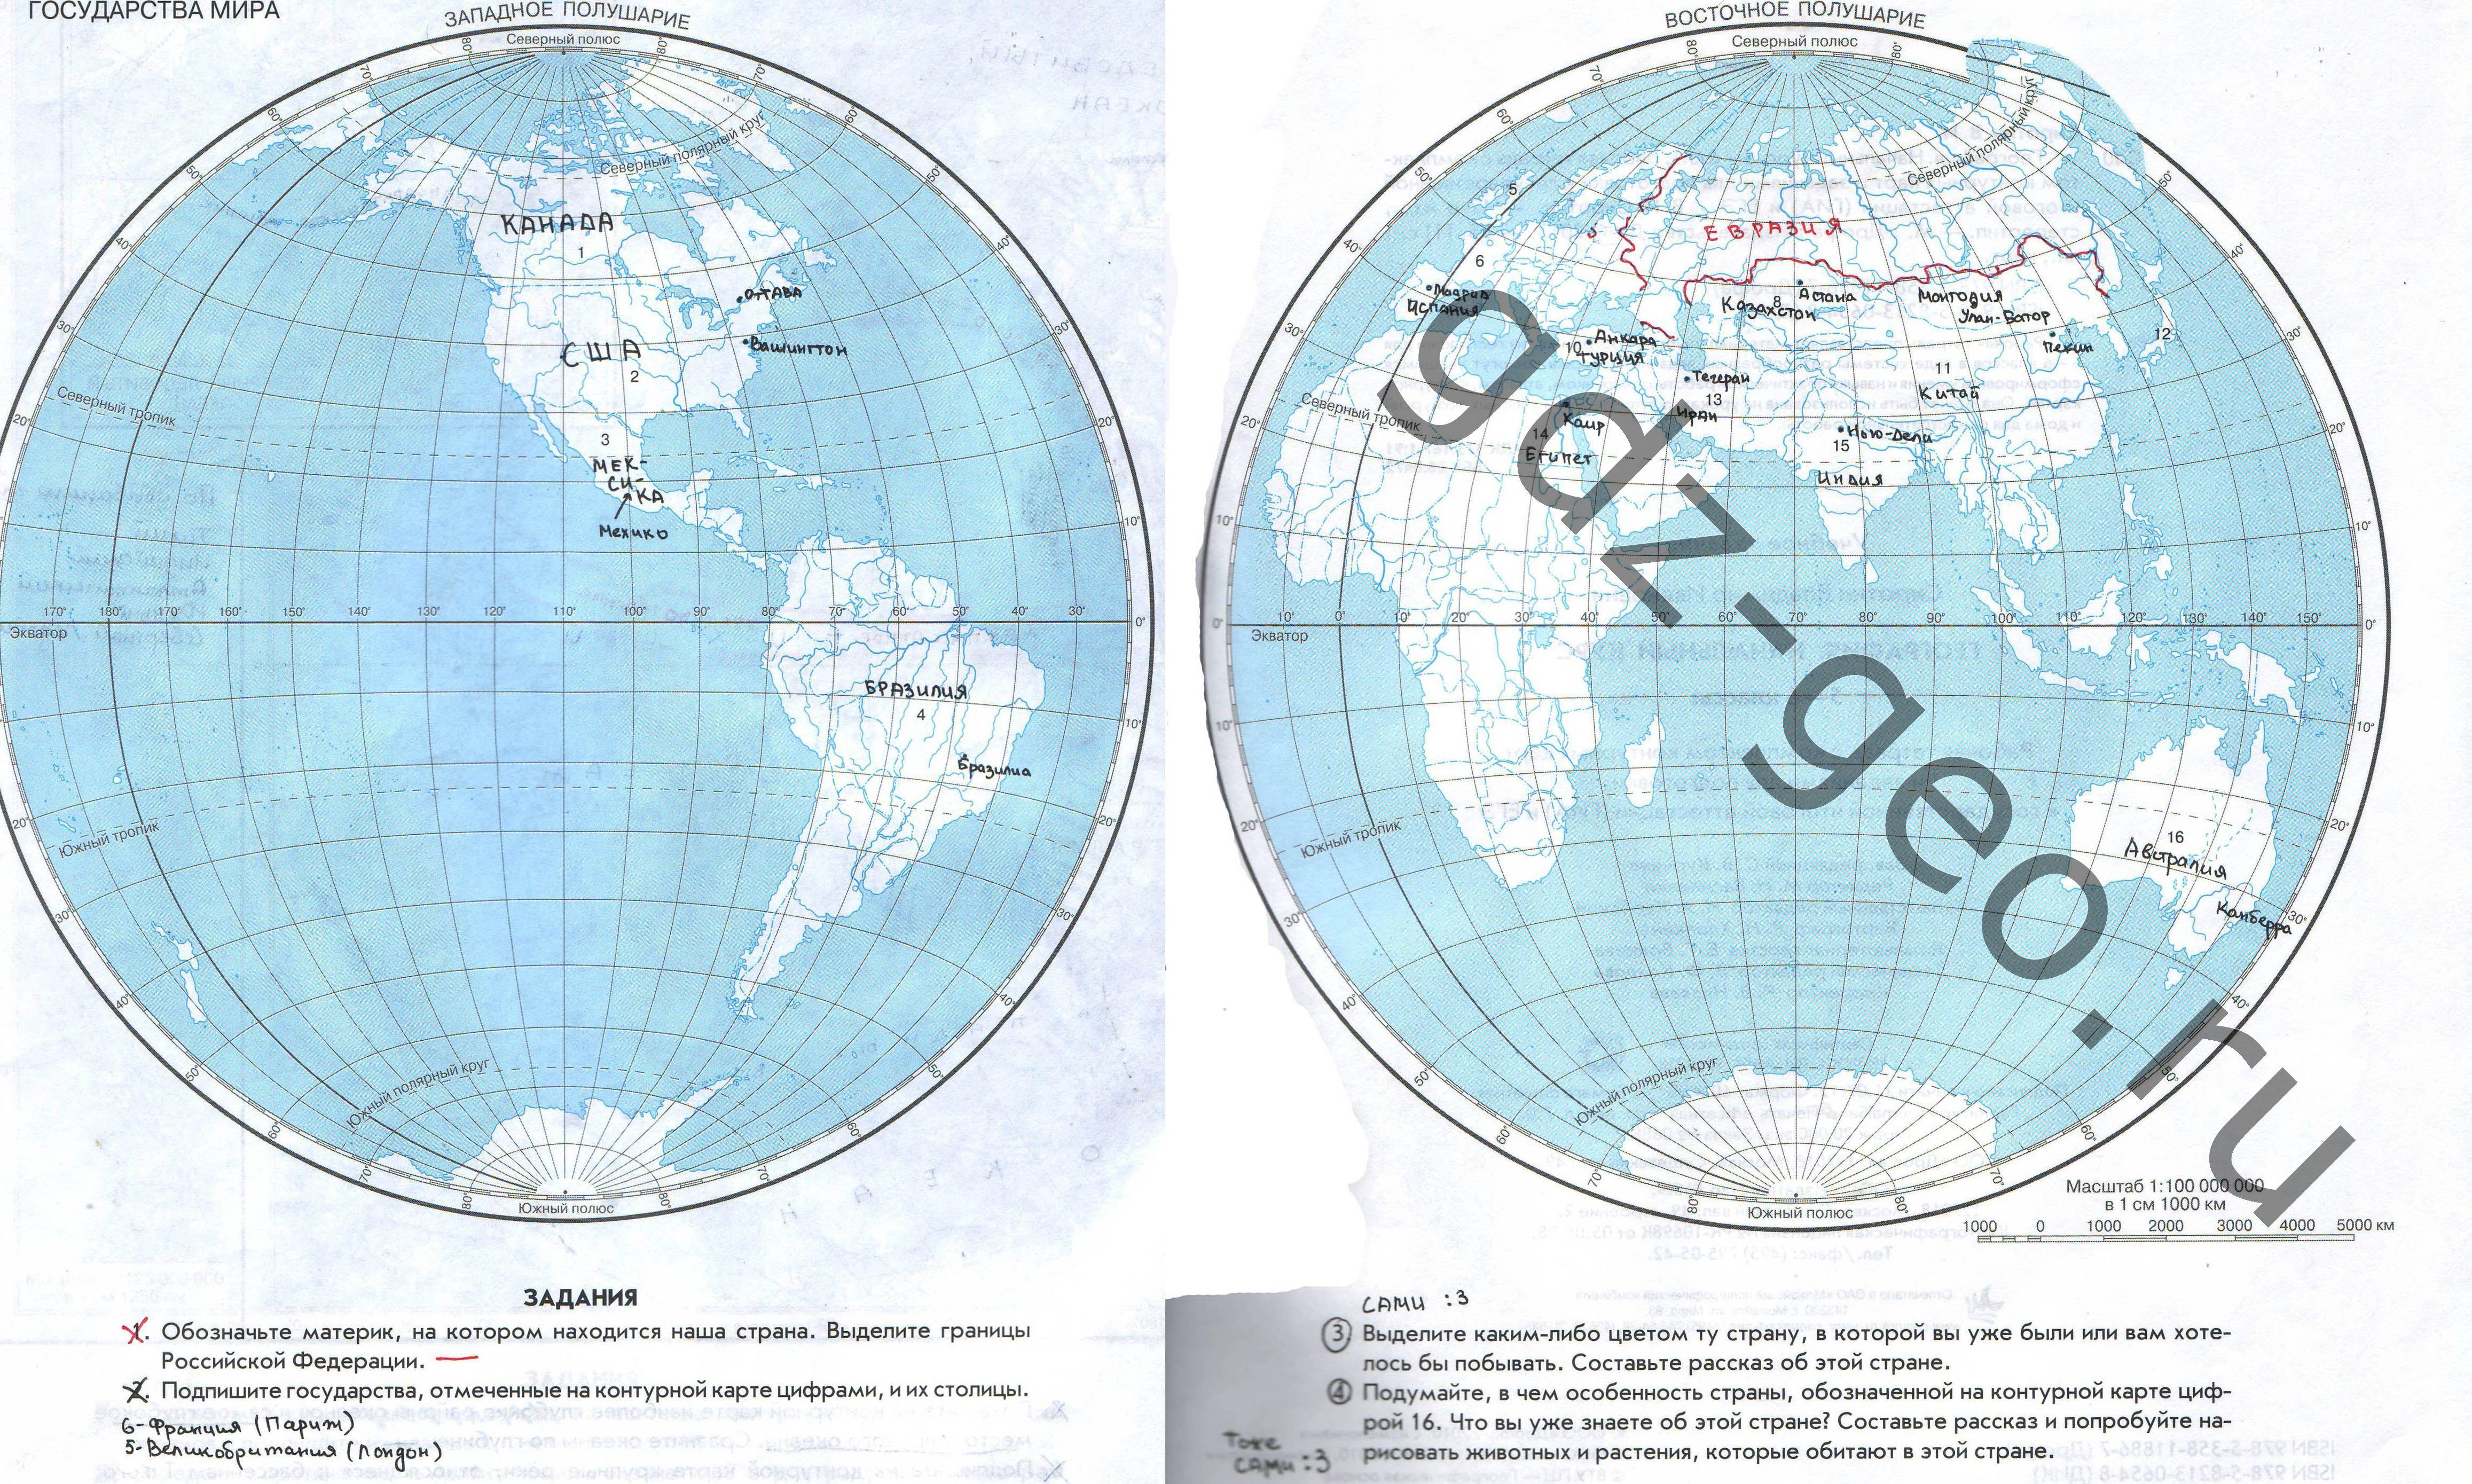 Решебник по географии землеведение 6 класс дрофа